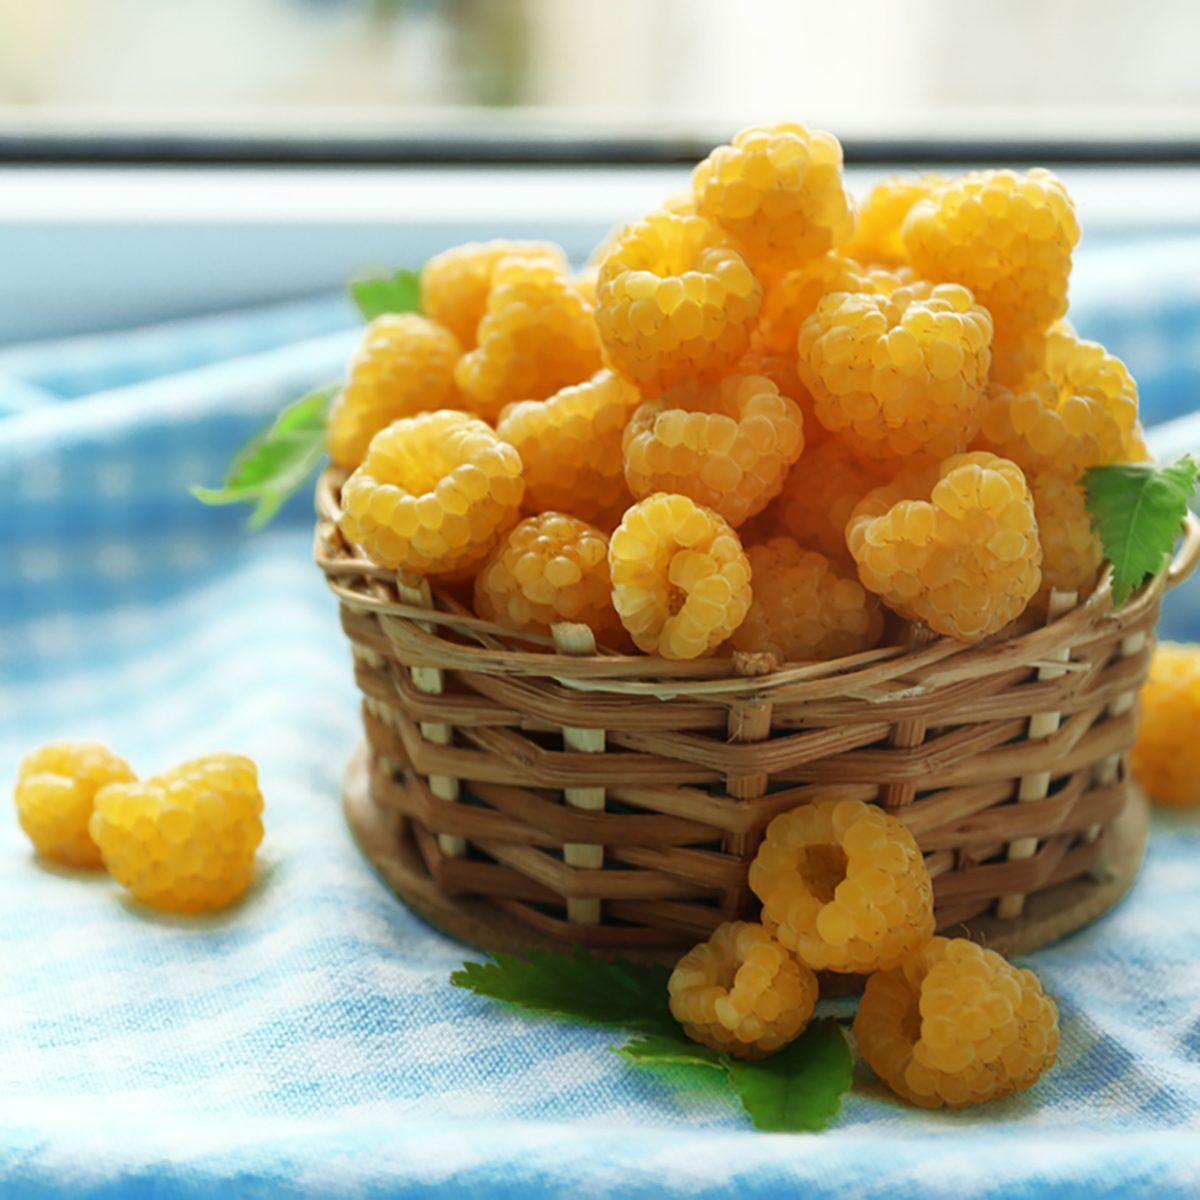 Yellow raspberries on checkered napkin, closeup;